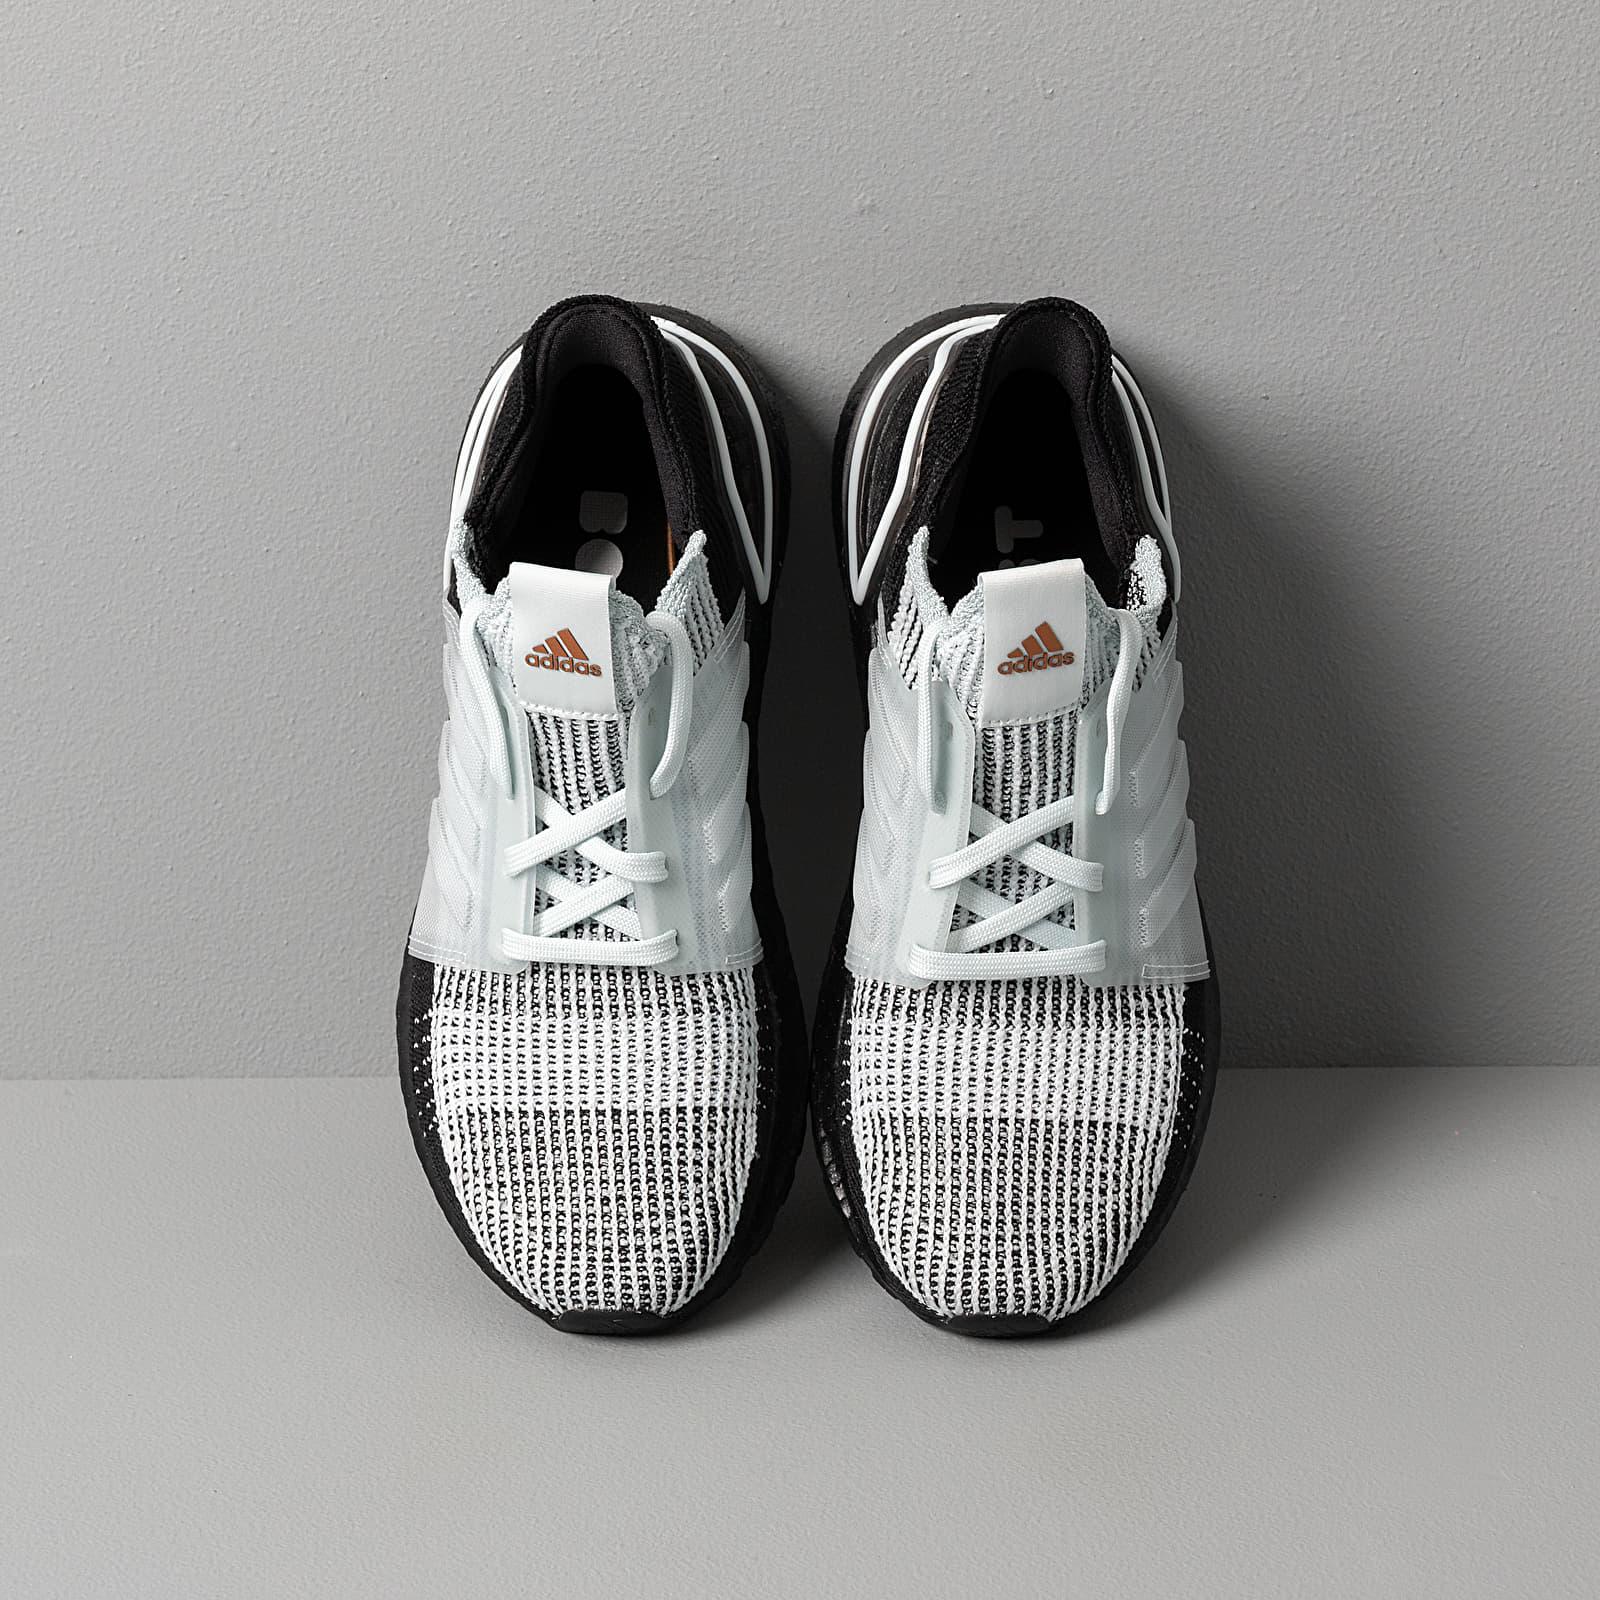 adidas UltraBOOST 19 W Blue Tint/ Core Black/ Copper Metalic   Footshop